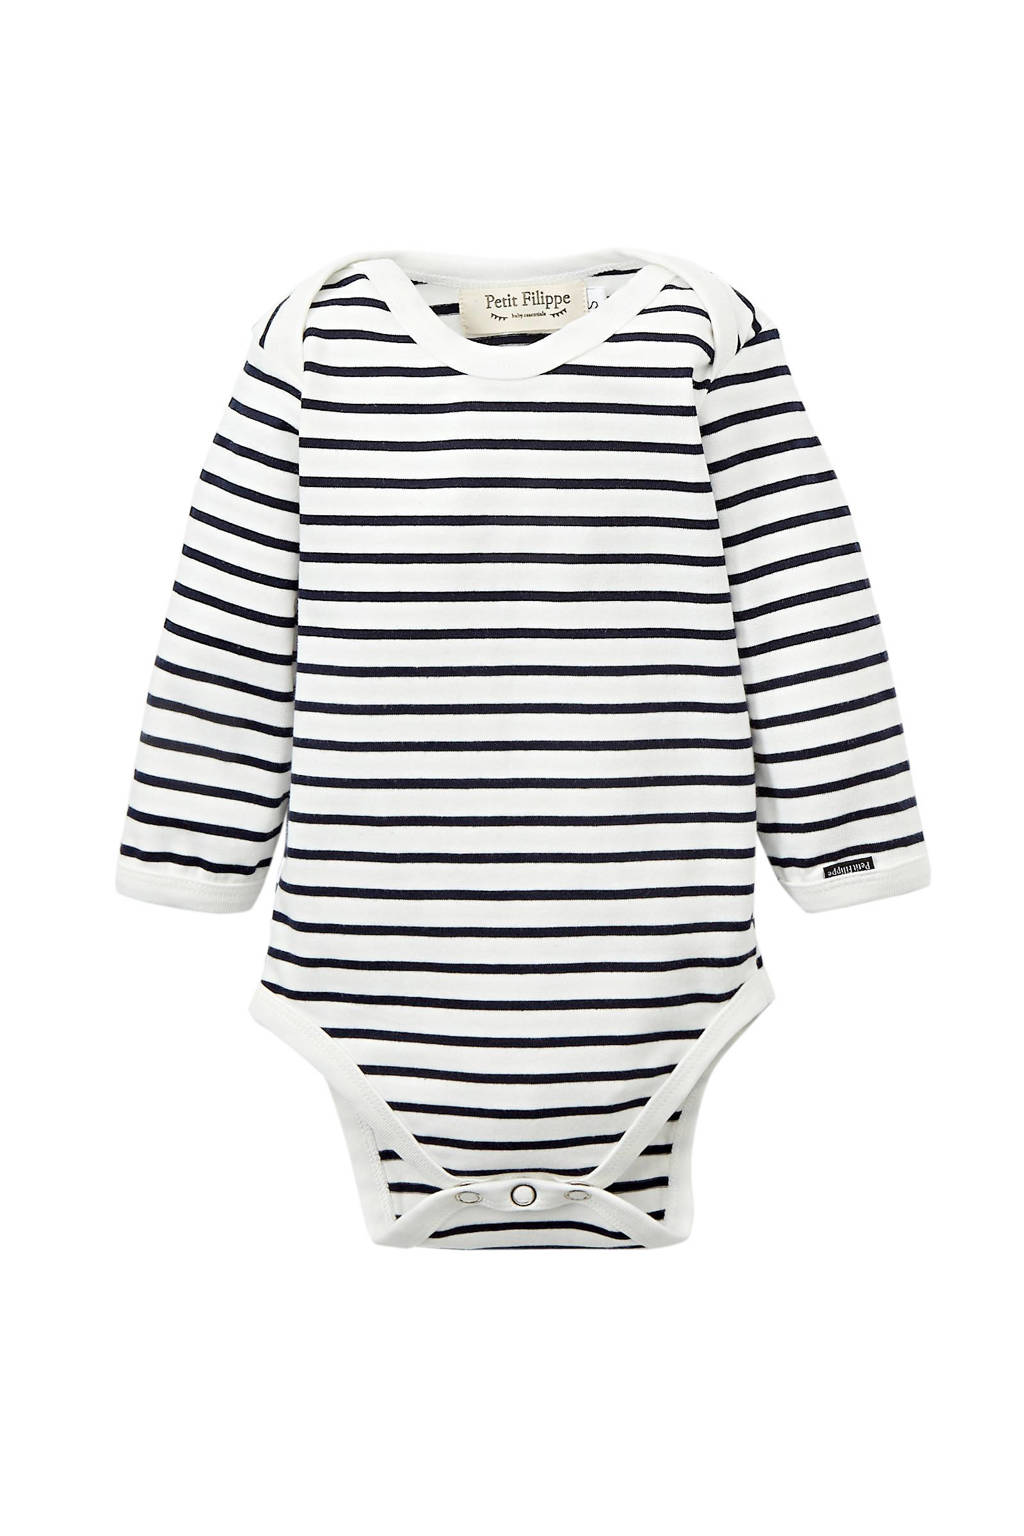 Petit Filippe baby romper lange mouw Breton Stripes donkerblauw/wit, Donkerblauw/wit